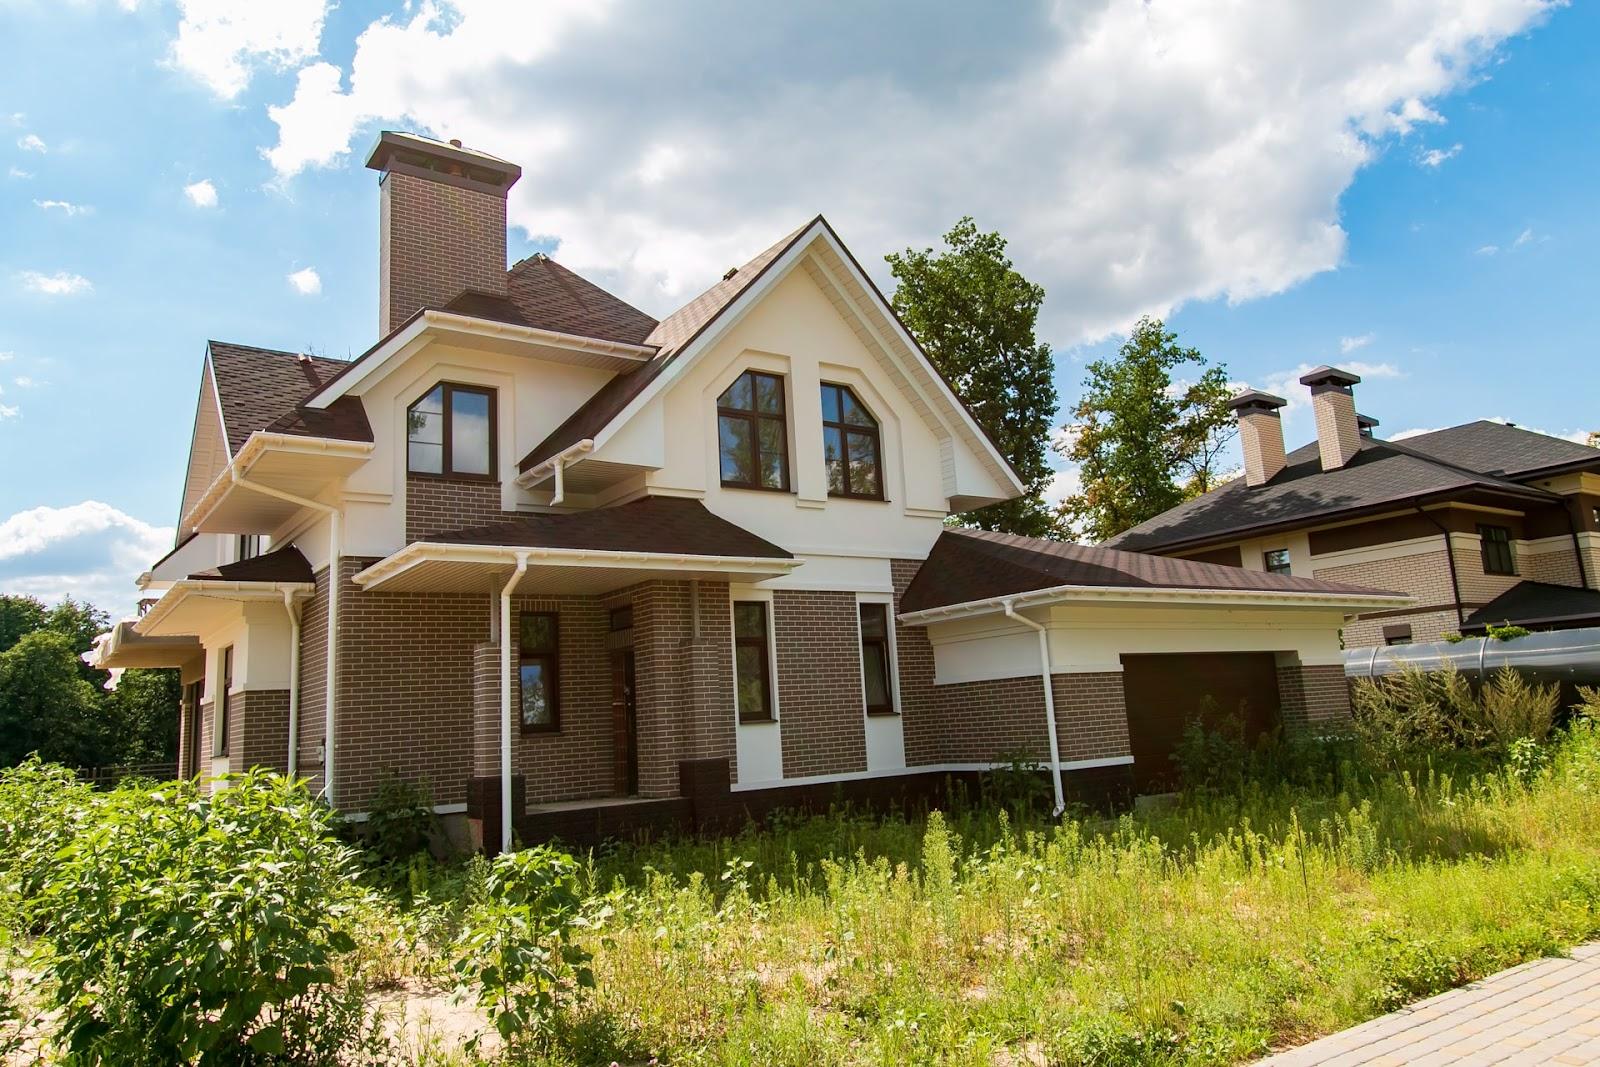 преимущества и недостатки дома из кирпича